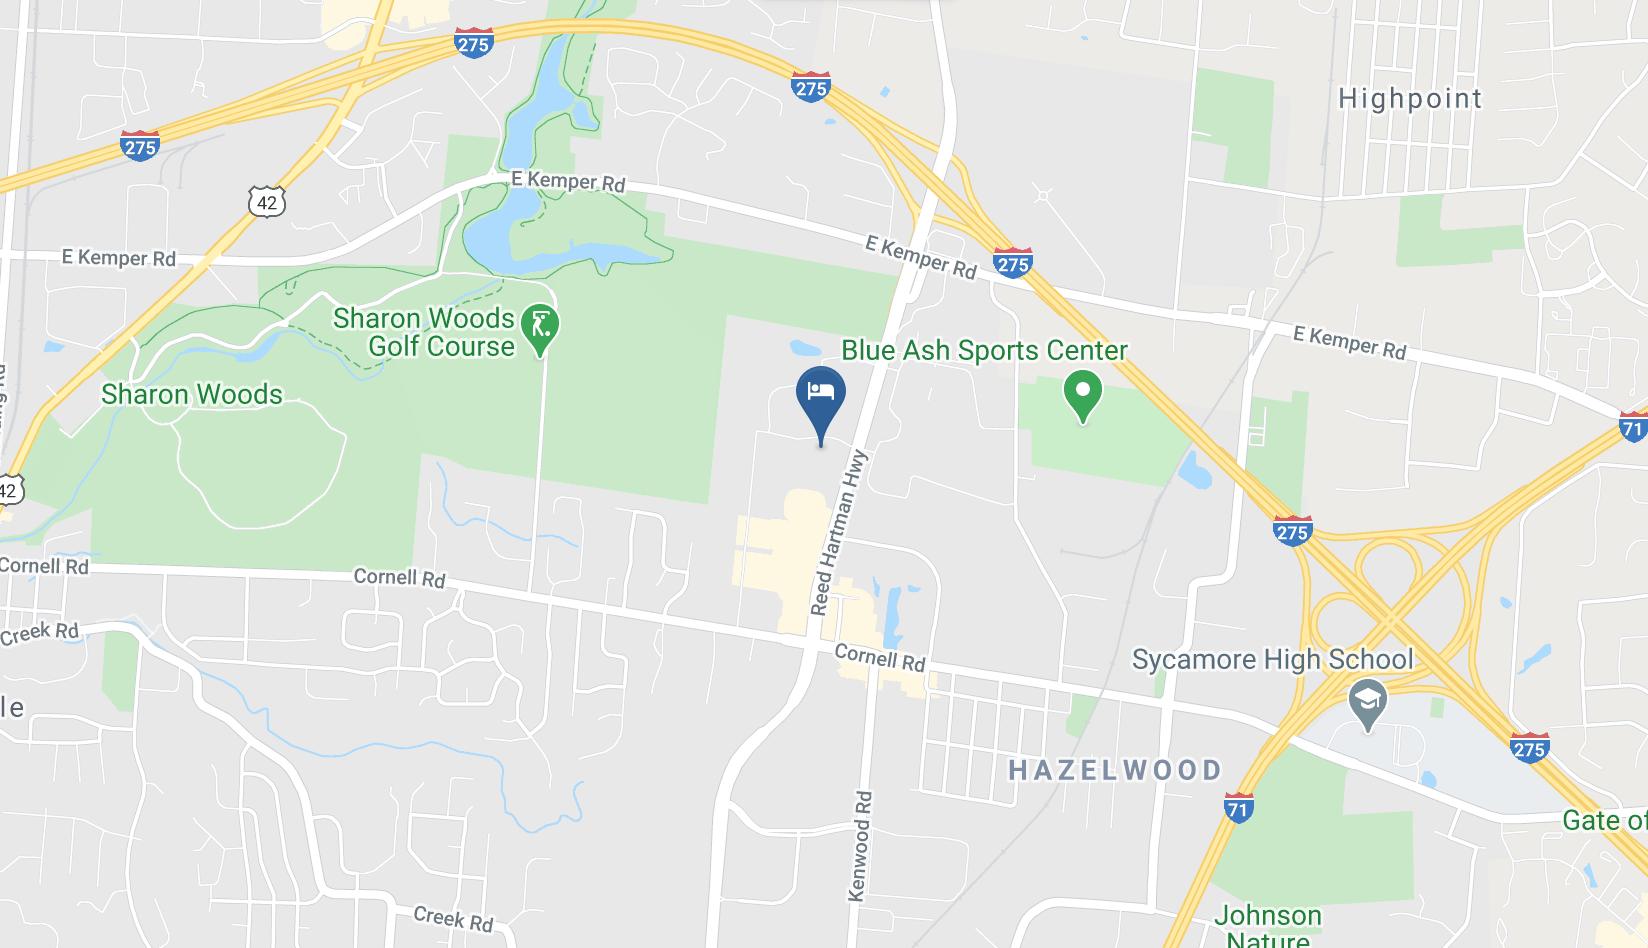 Google Map of Hyatt Place Cincinnati Blue Ash